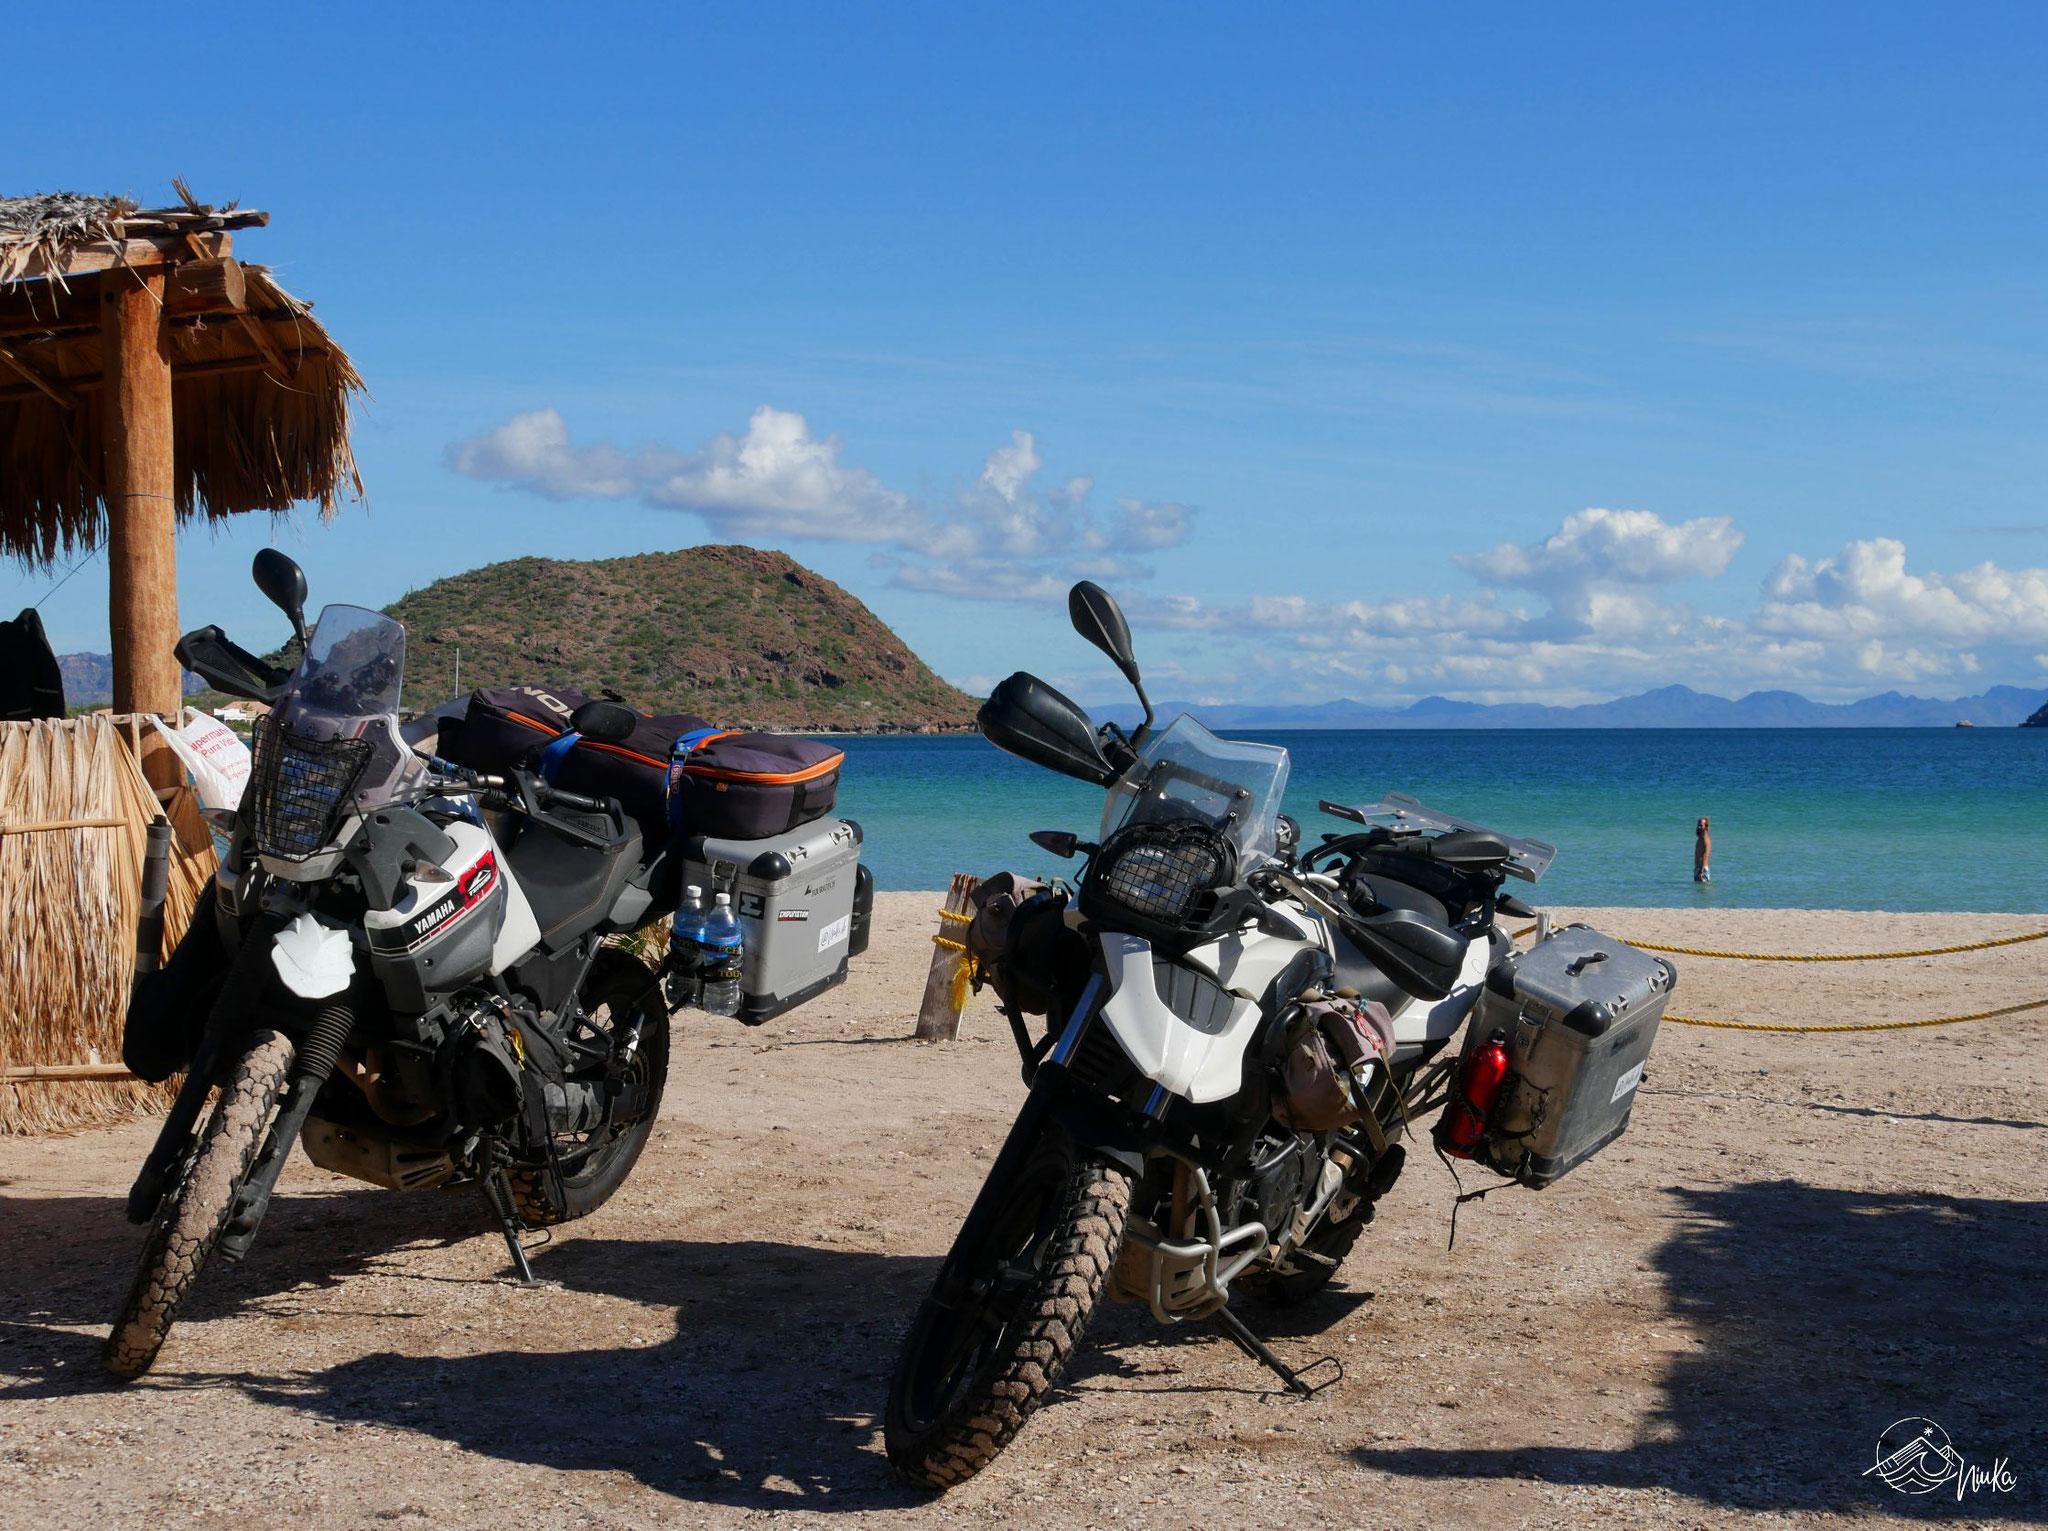 Playa Santispac